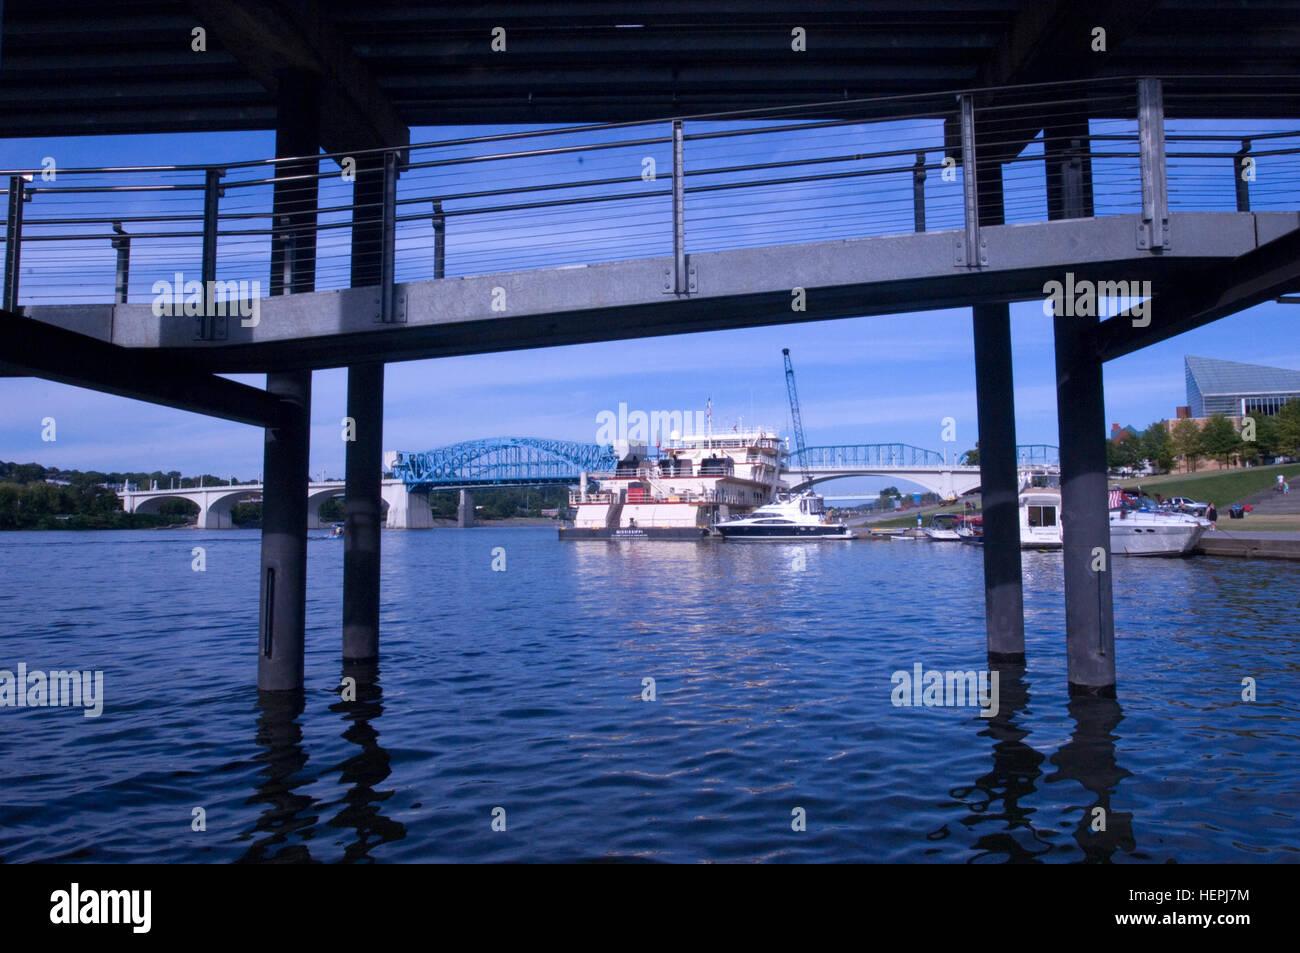 The Motor Vessel Mississippi is docked at Ross's Landing in Chattanooga, Tenn., Aug. 8, 2015. The M/V Mississippi - Stock Image